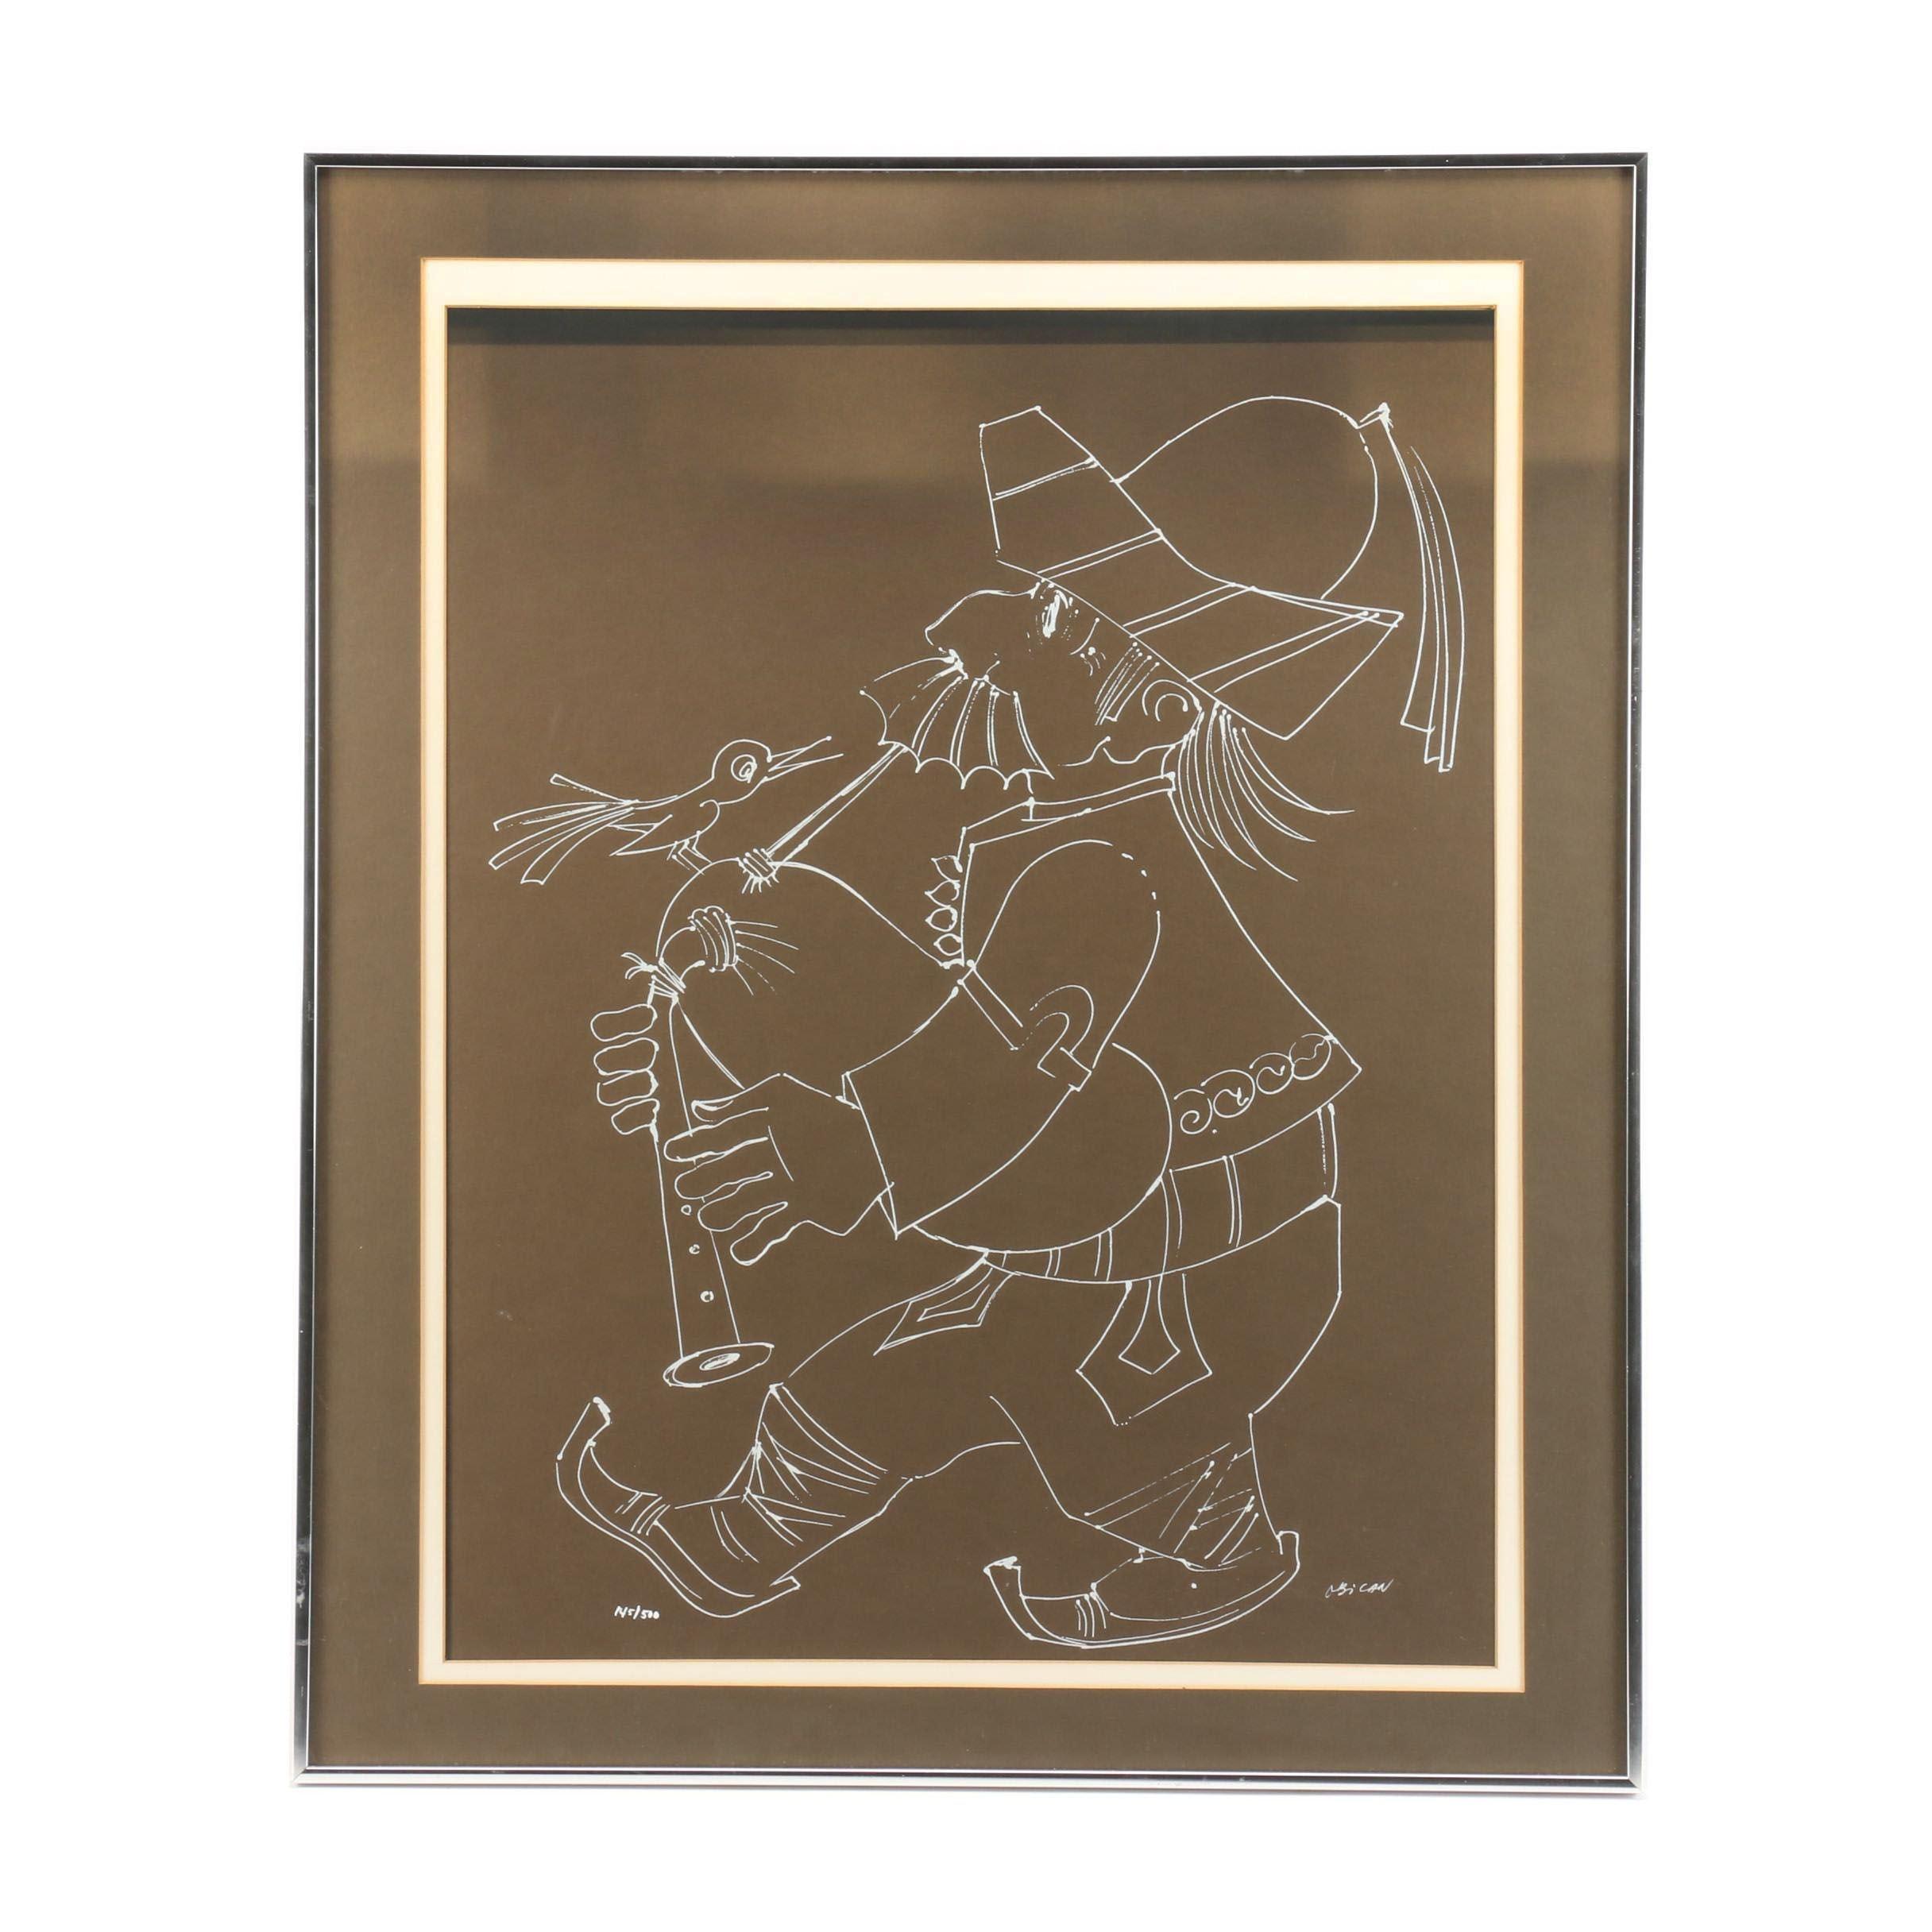 Jovan Obican Figural Limited Edition Serigraph